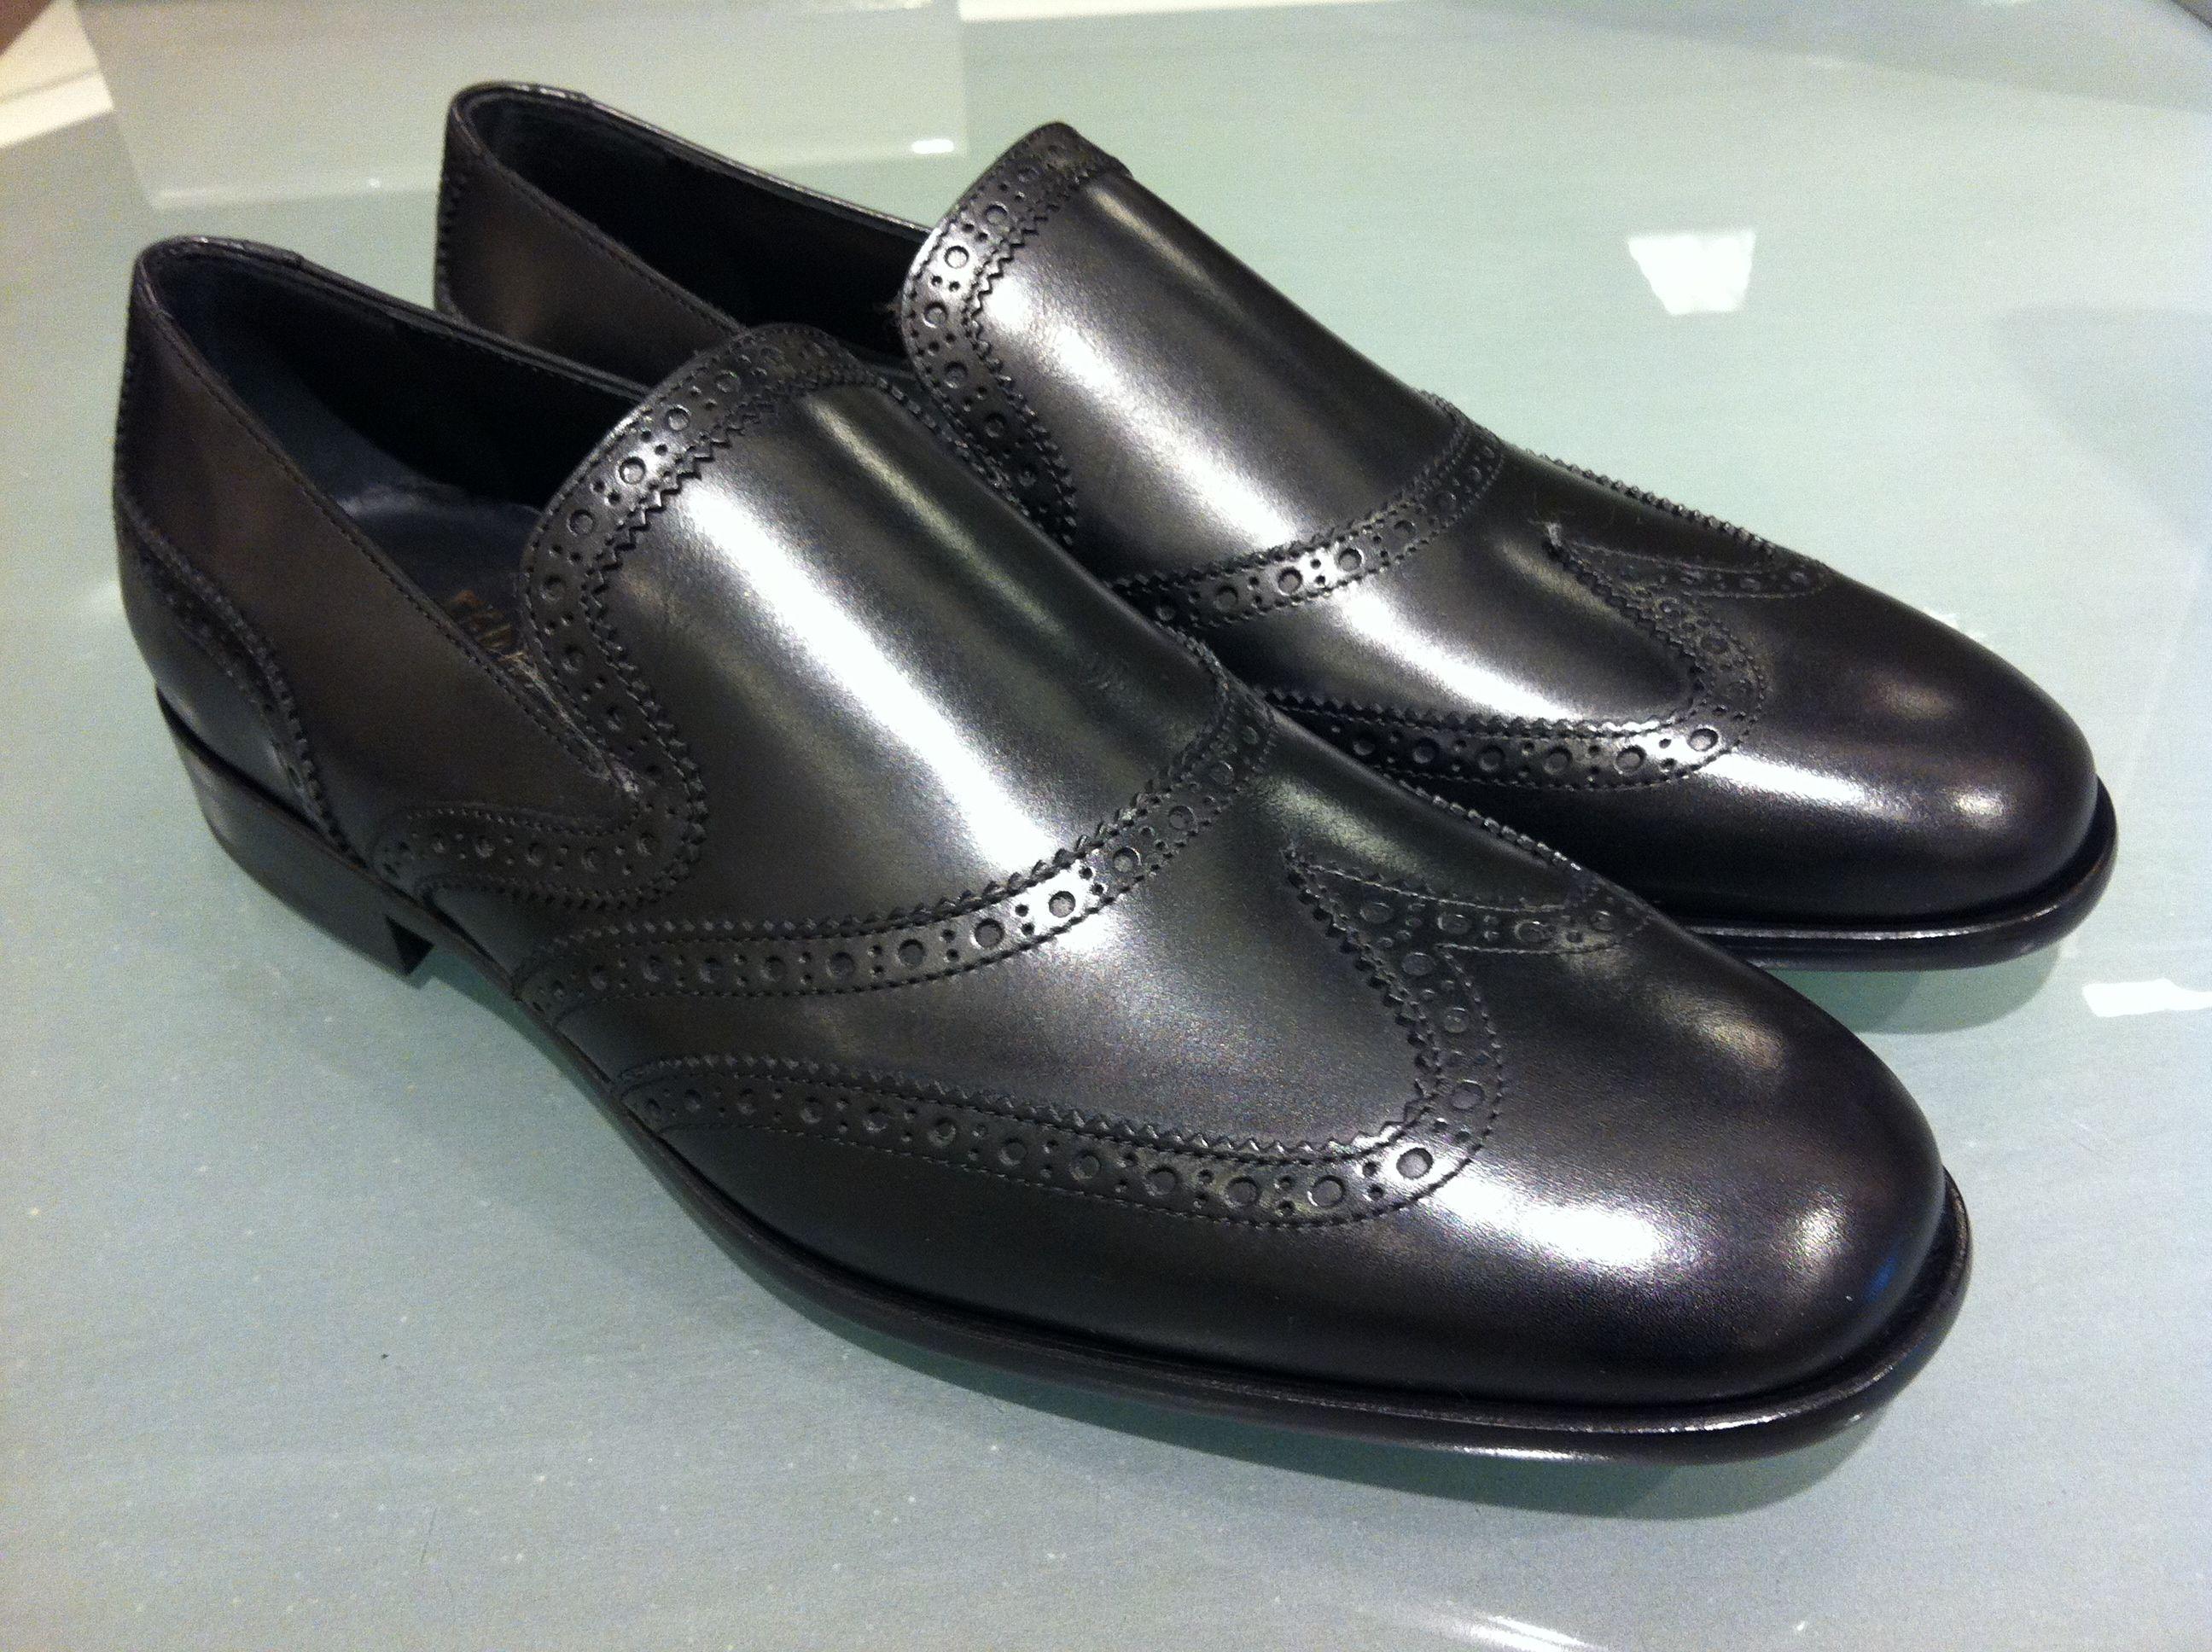 f880133d4d59 Ferragamo at Nordstrom Men s Shoes in Paramus